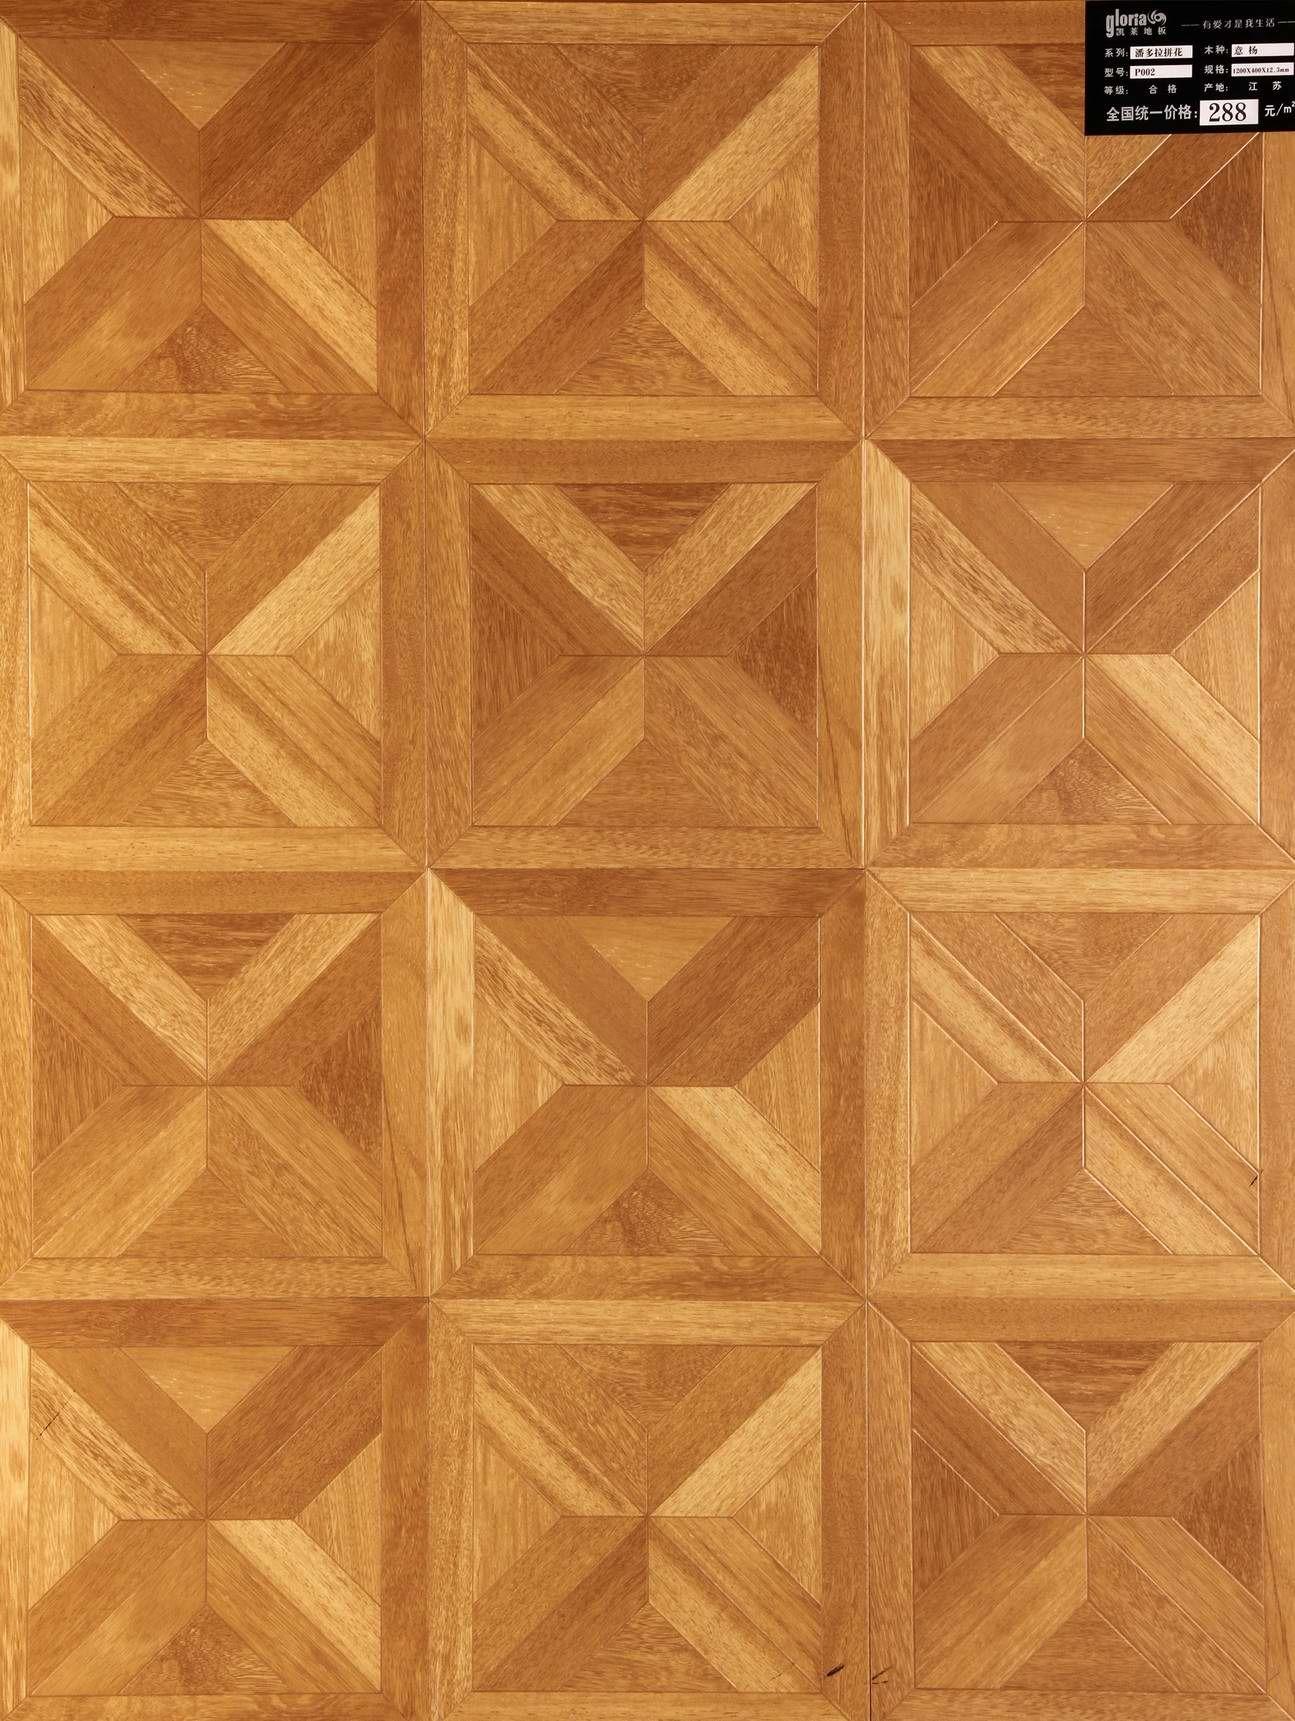 parquet floor styles | Parquet Flooring (P002) | Barquet Floor ...